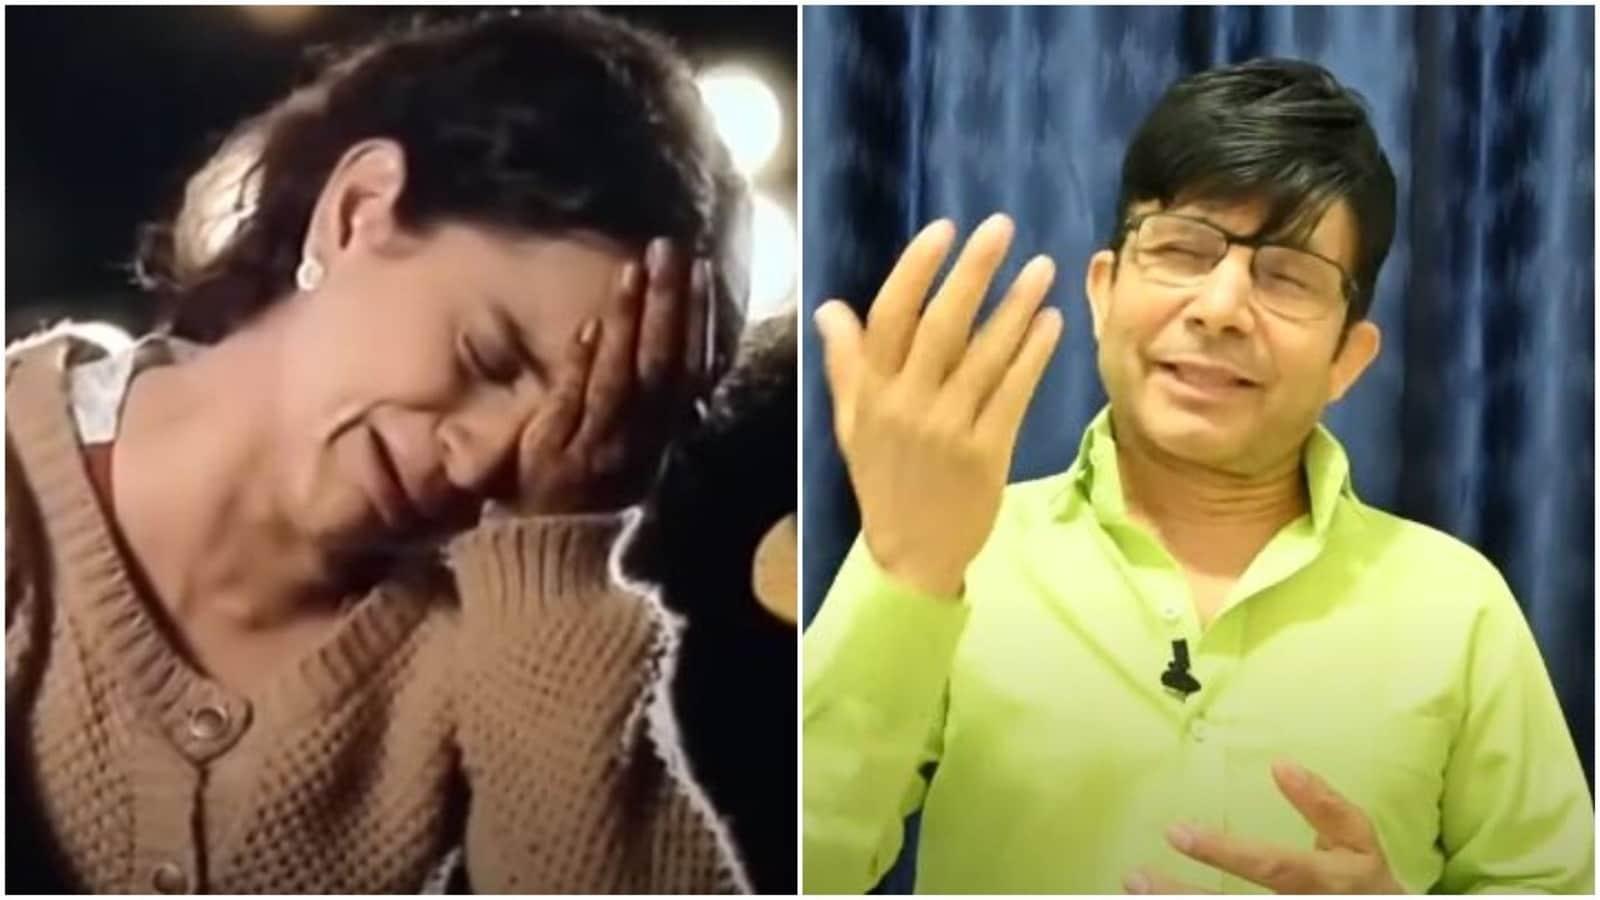 KRK targets 'barwi fail' Kangana Ranaut, pretends to weep as he mocks her  in new video | Bollywood - Hindustan Times